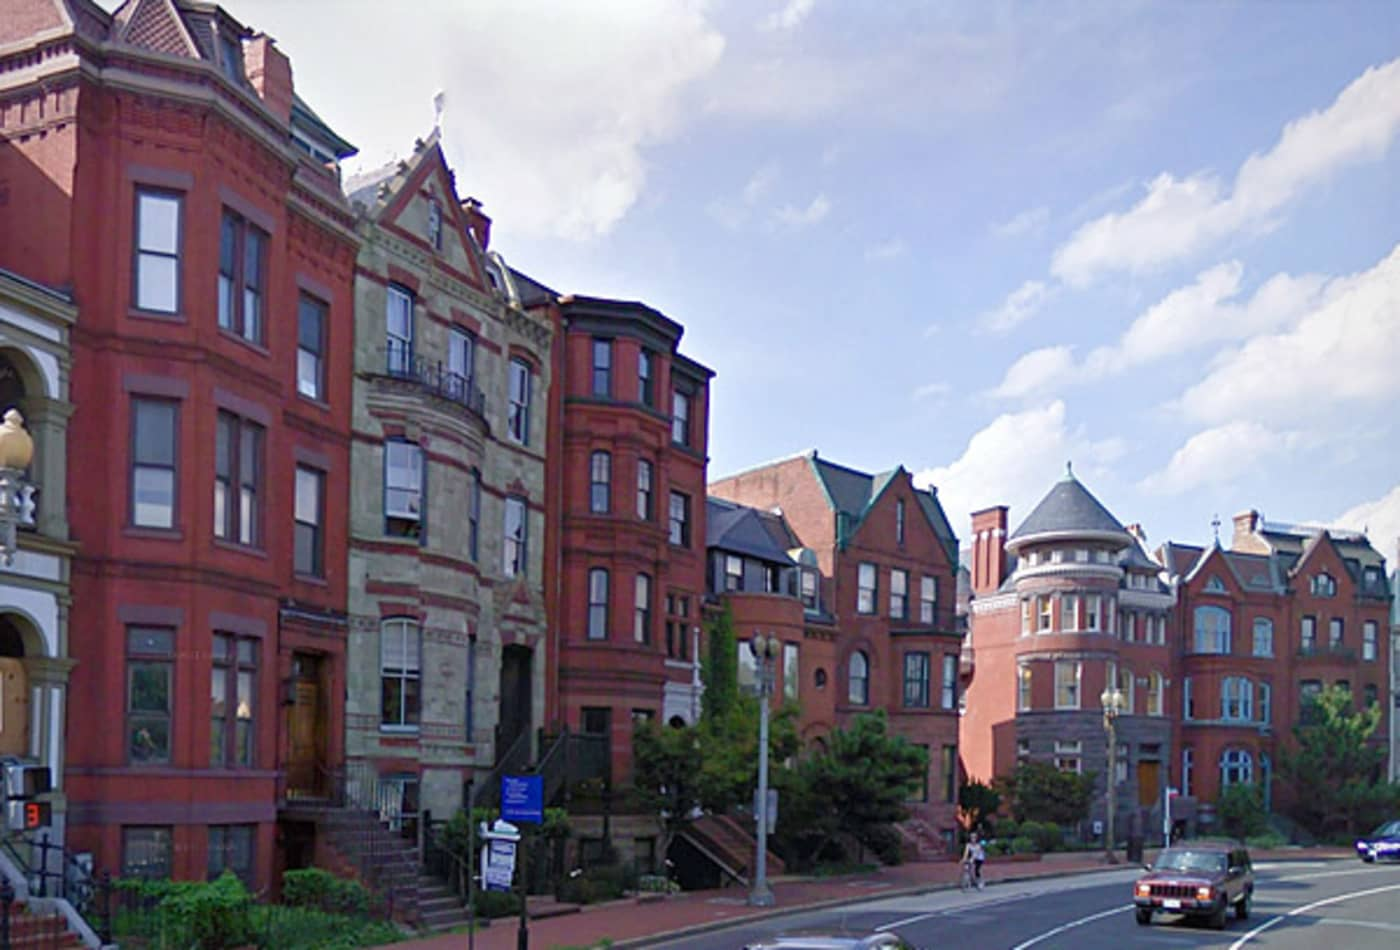 Logan-Circle-Washington-DC-Best-Kept-Secret-Neighborhoods-CNBC.jpg